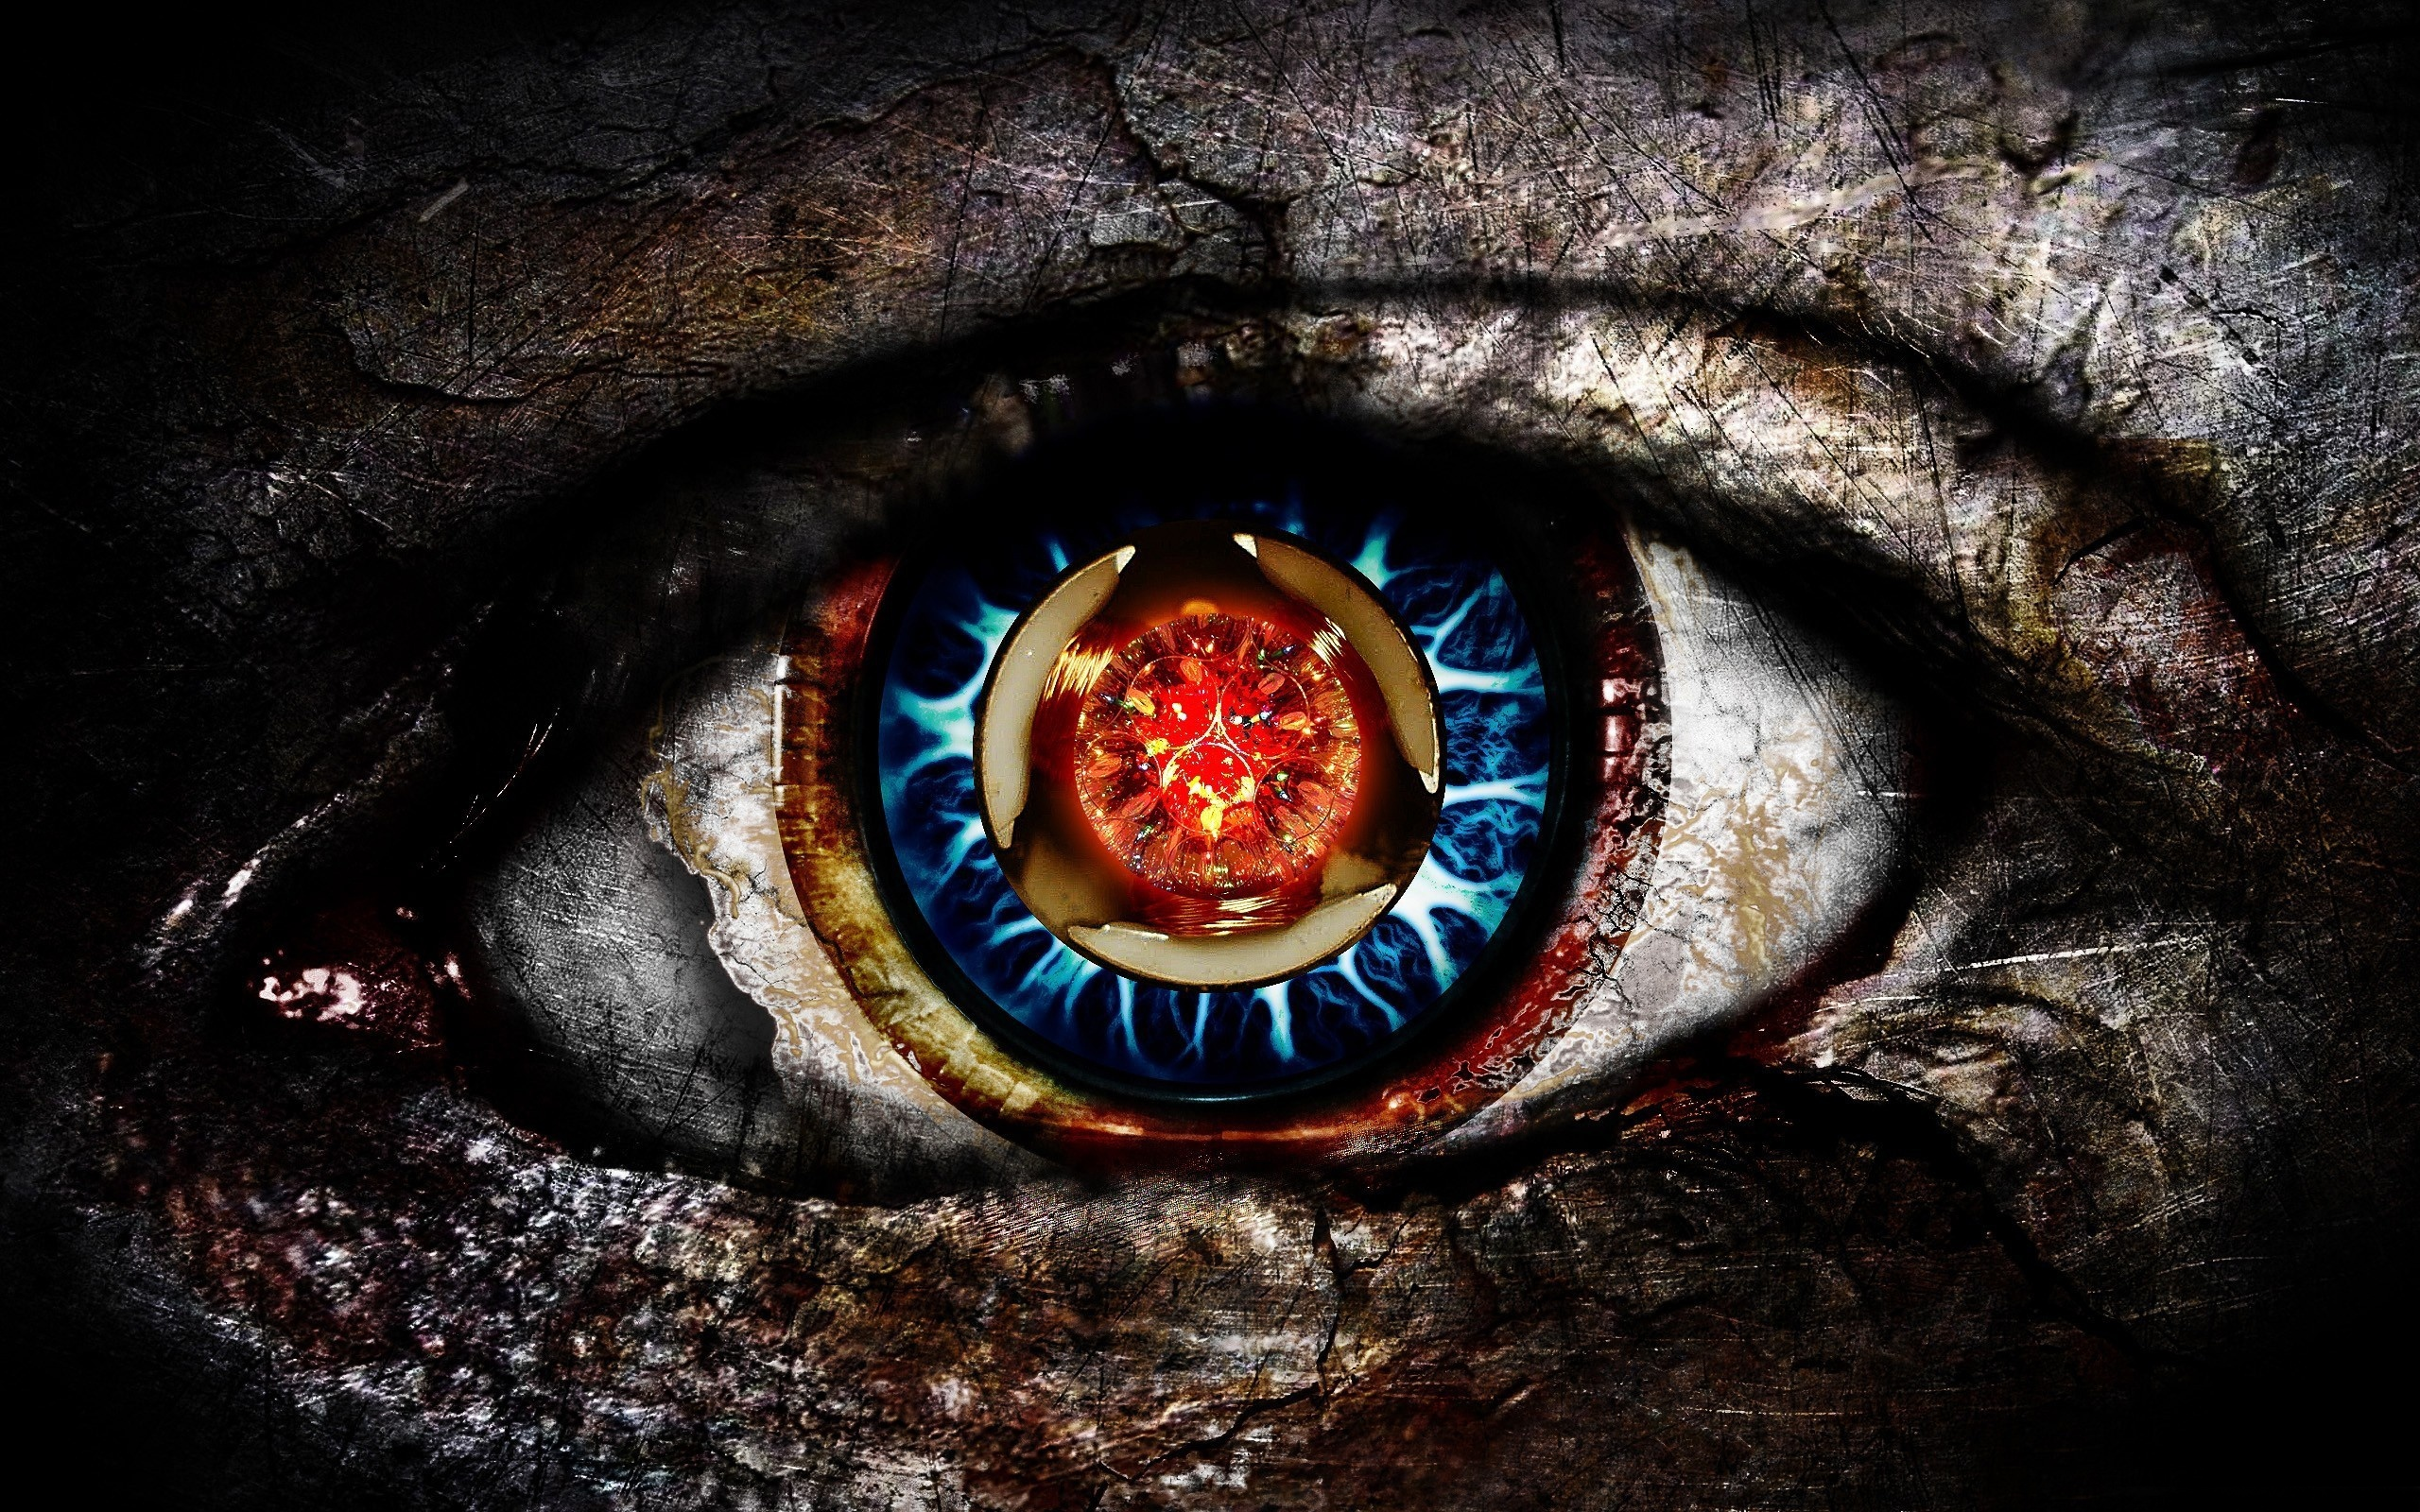 Digital Abstract Eye #6991637